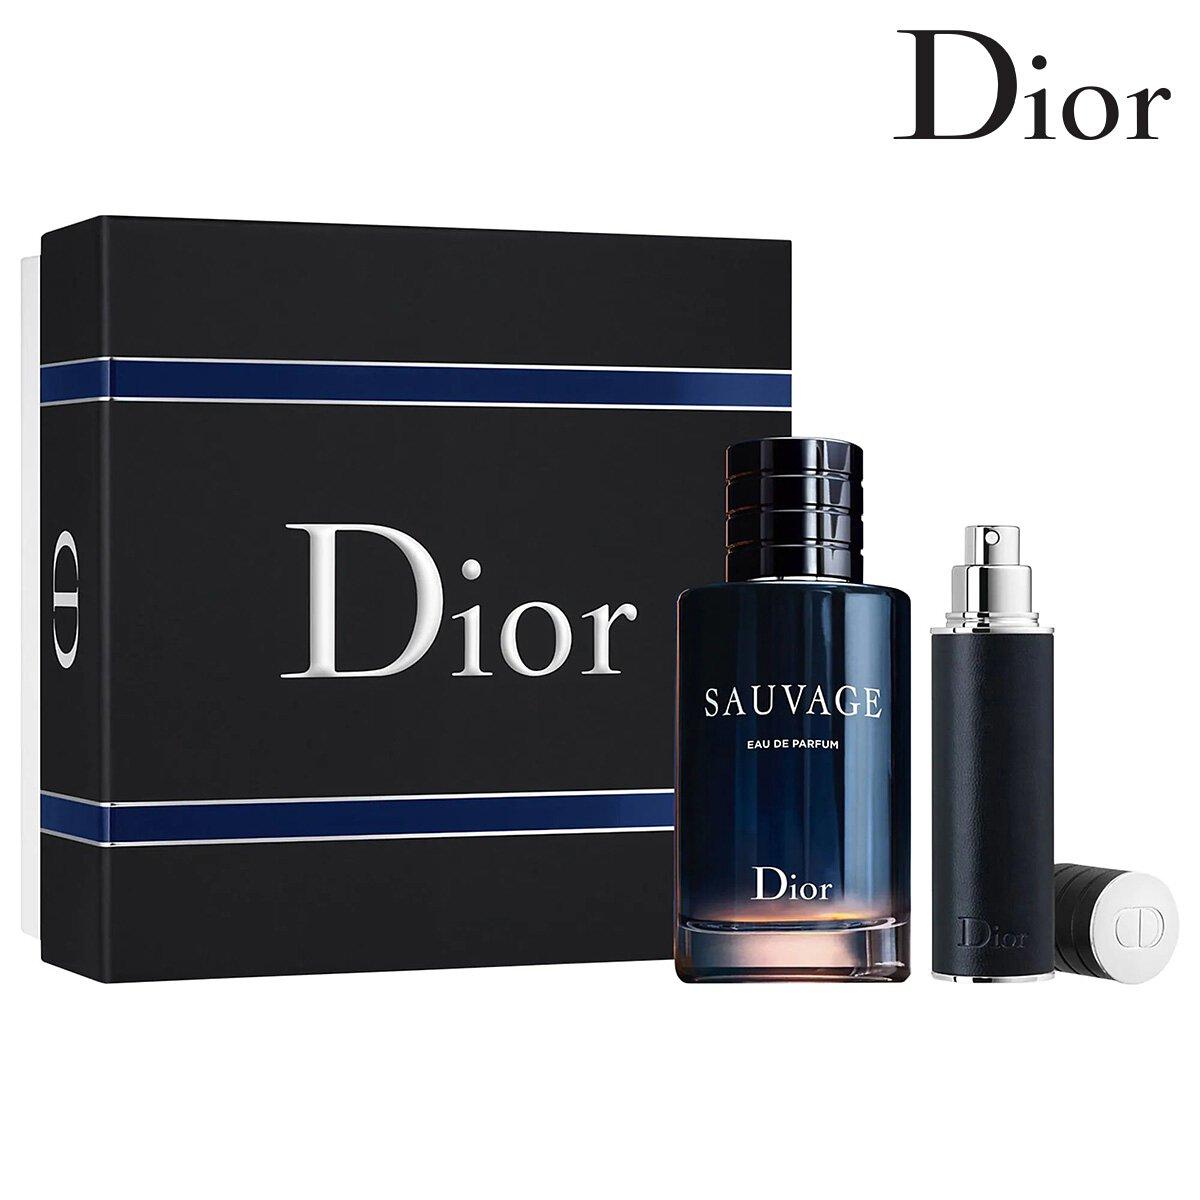 Dior 迪奧 曠野之心男性淡香精禮盒組 100ml +10ml